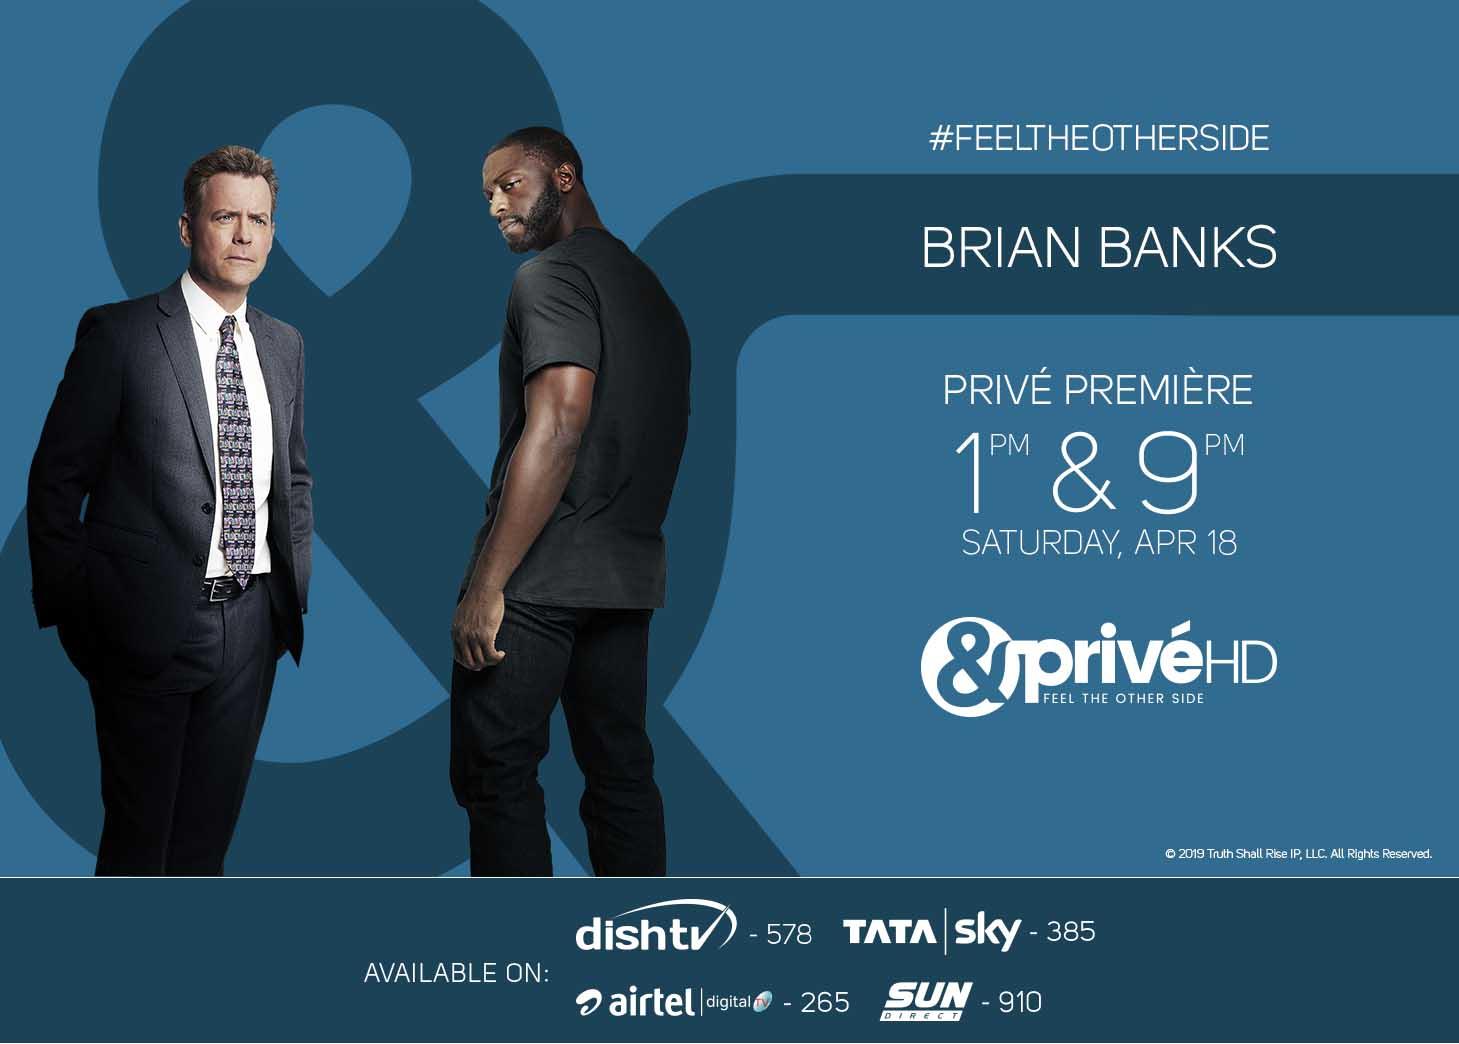 &PrivéHD is all set to premiere Brian Banks